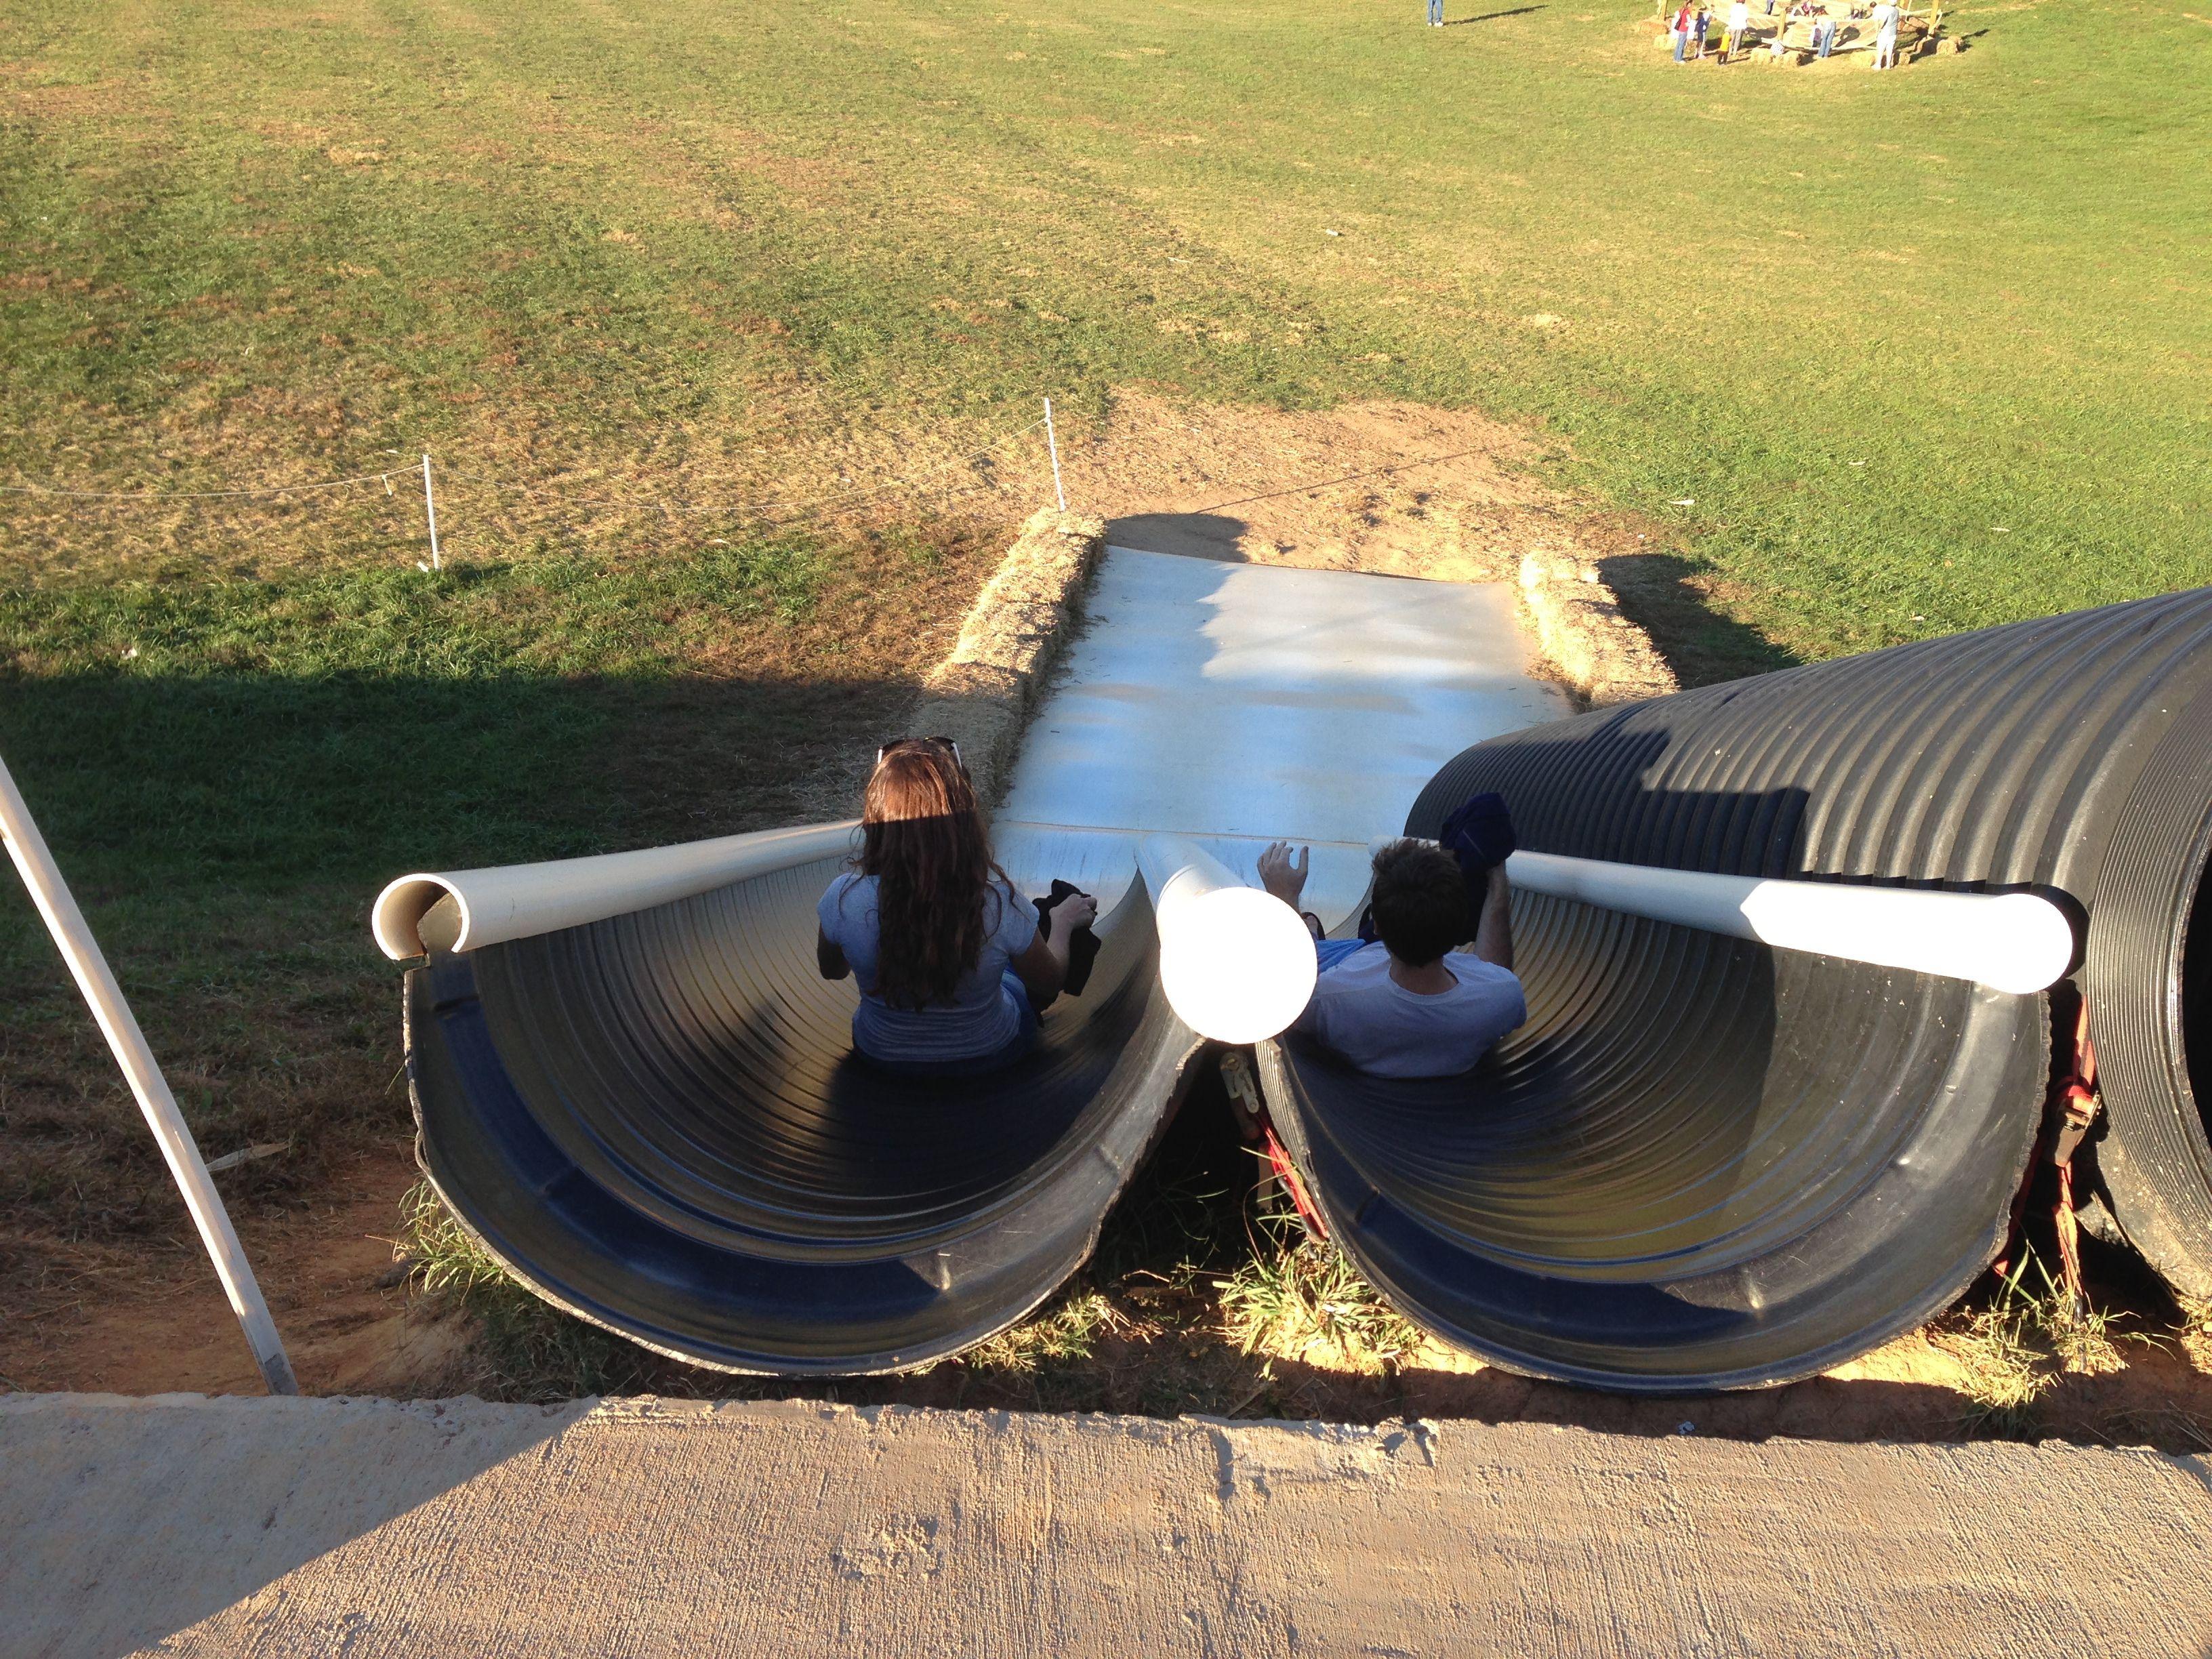 Homemade Slide Ty Wants One Wynn Haha Backyard Playground Backyard Play Diy Playground